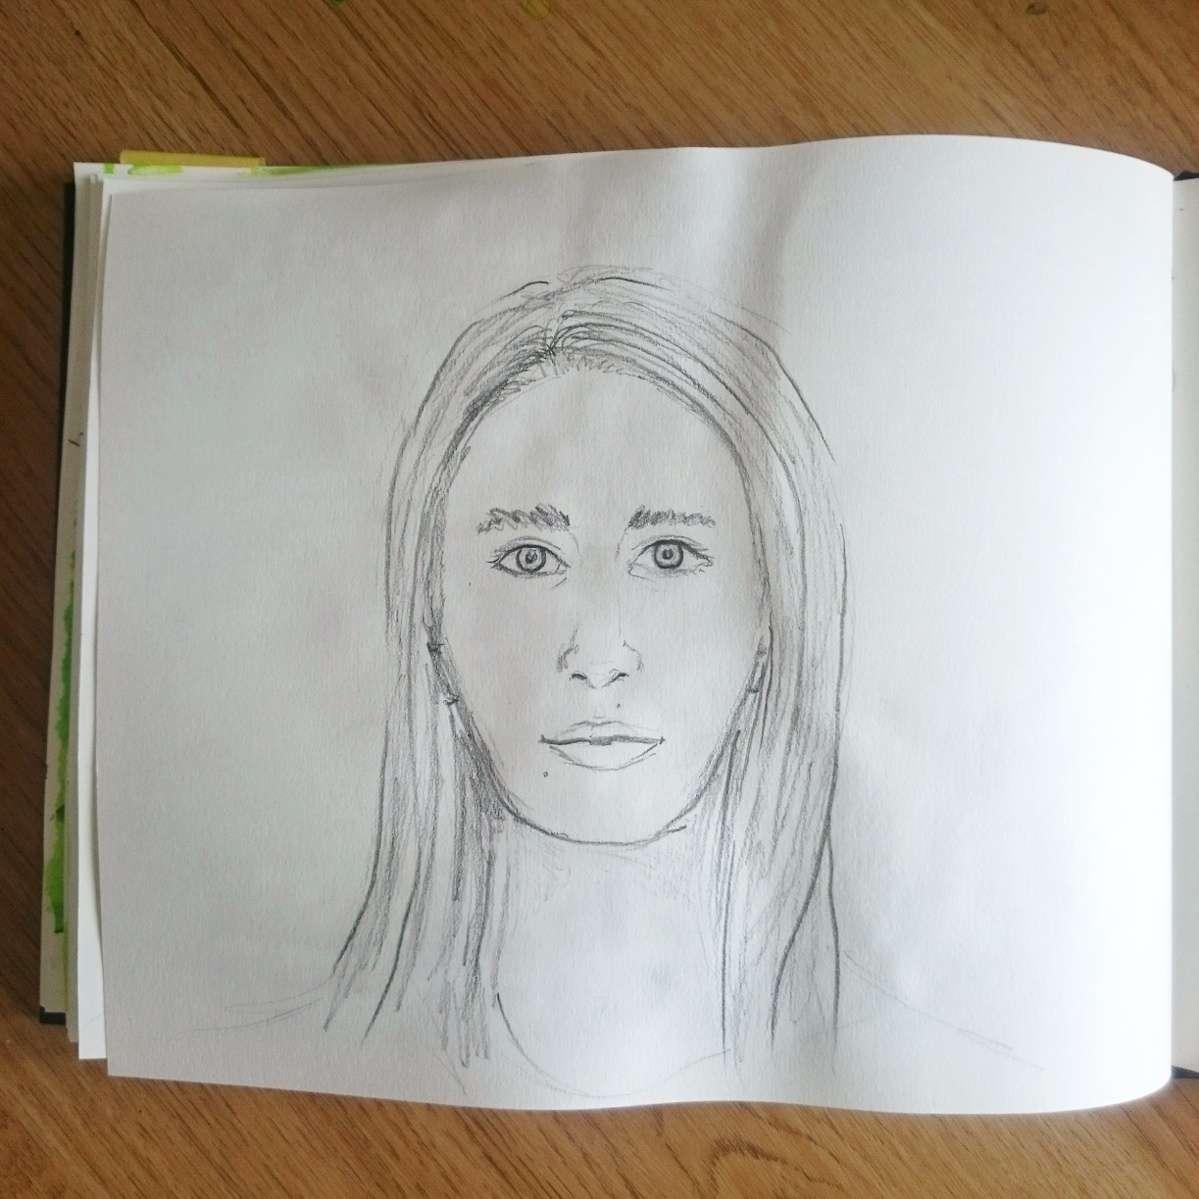 Day 15 28 Drawings Later Sketchbook Challenge by Jo Degenhart